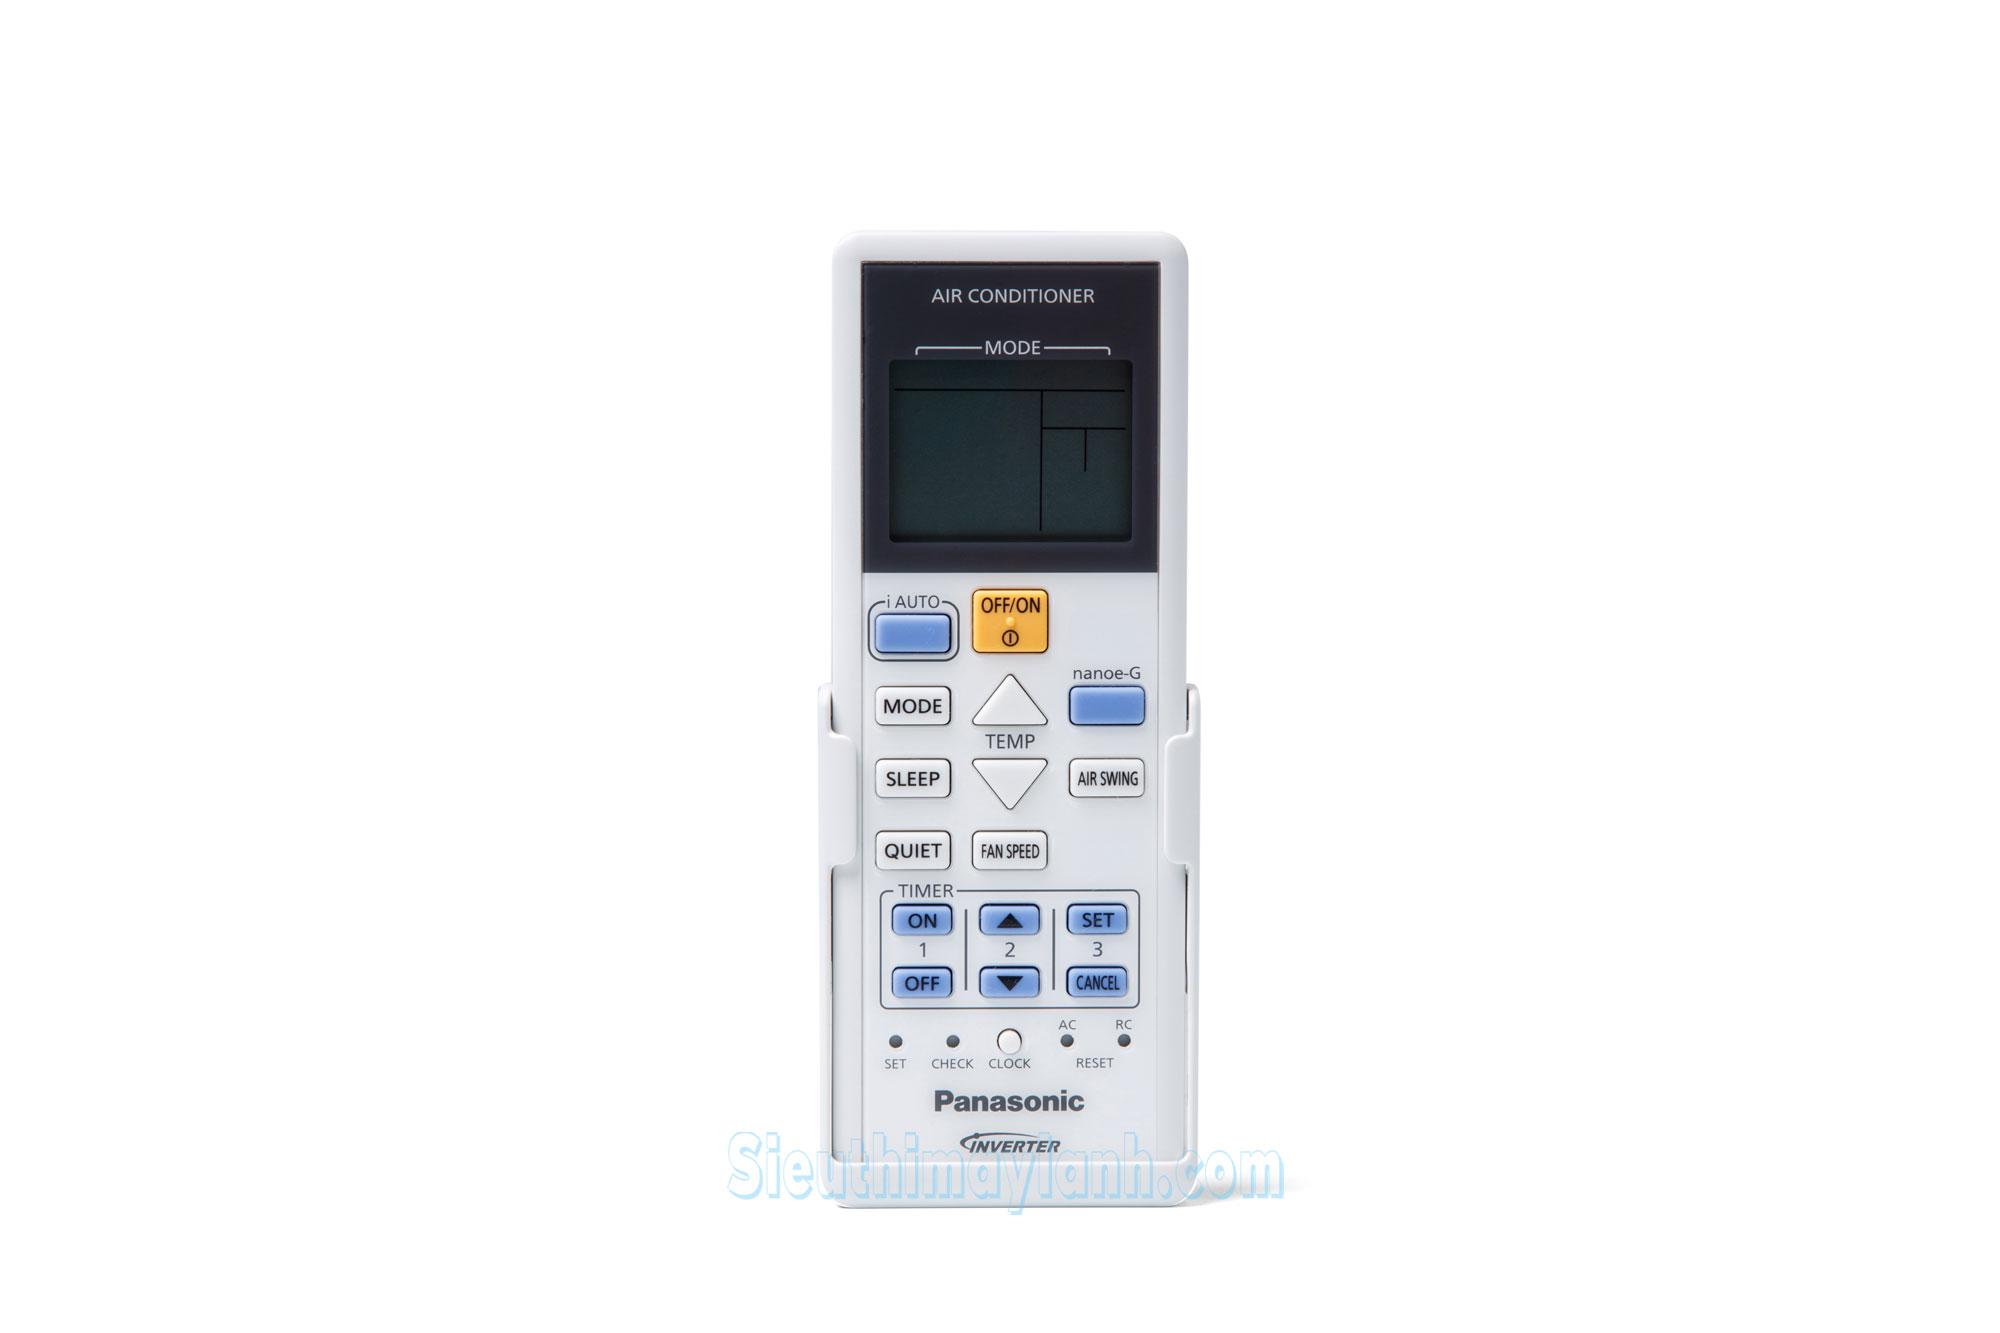 Panasonic Air Conditioner inverter PU24TKH-8 (2 5Hp)